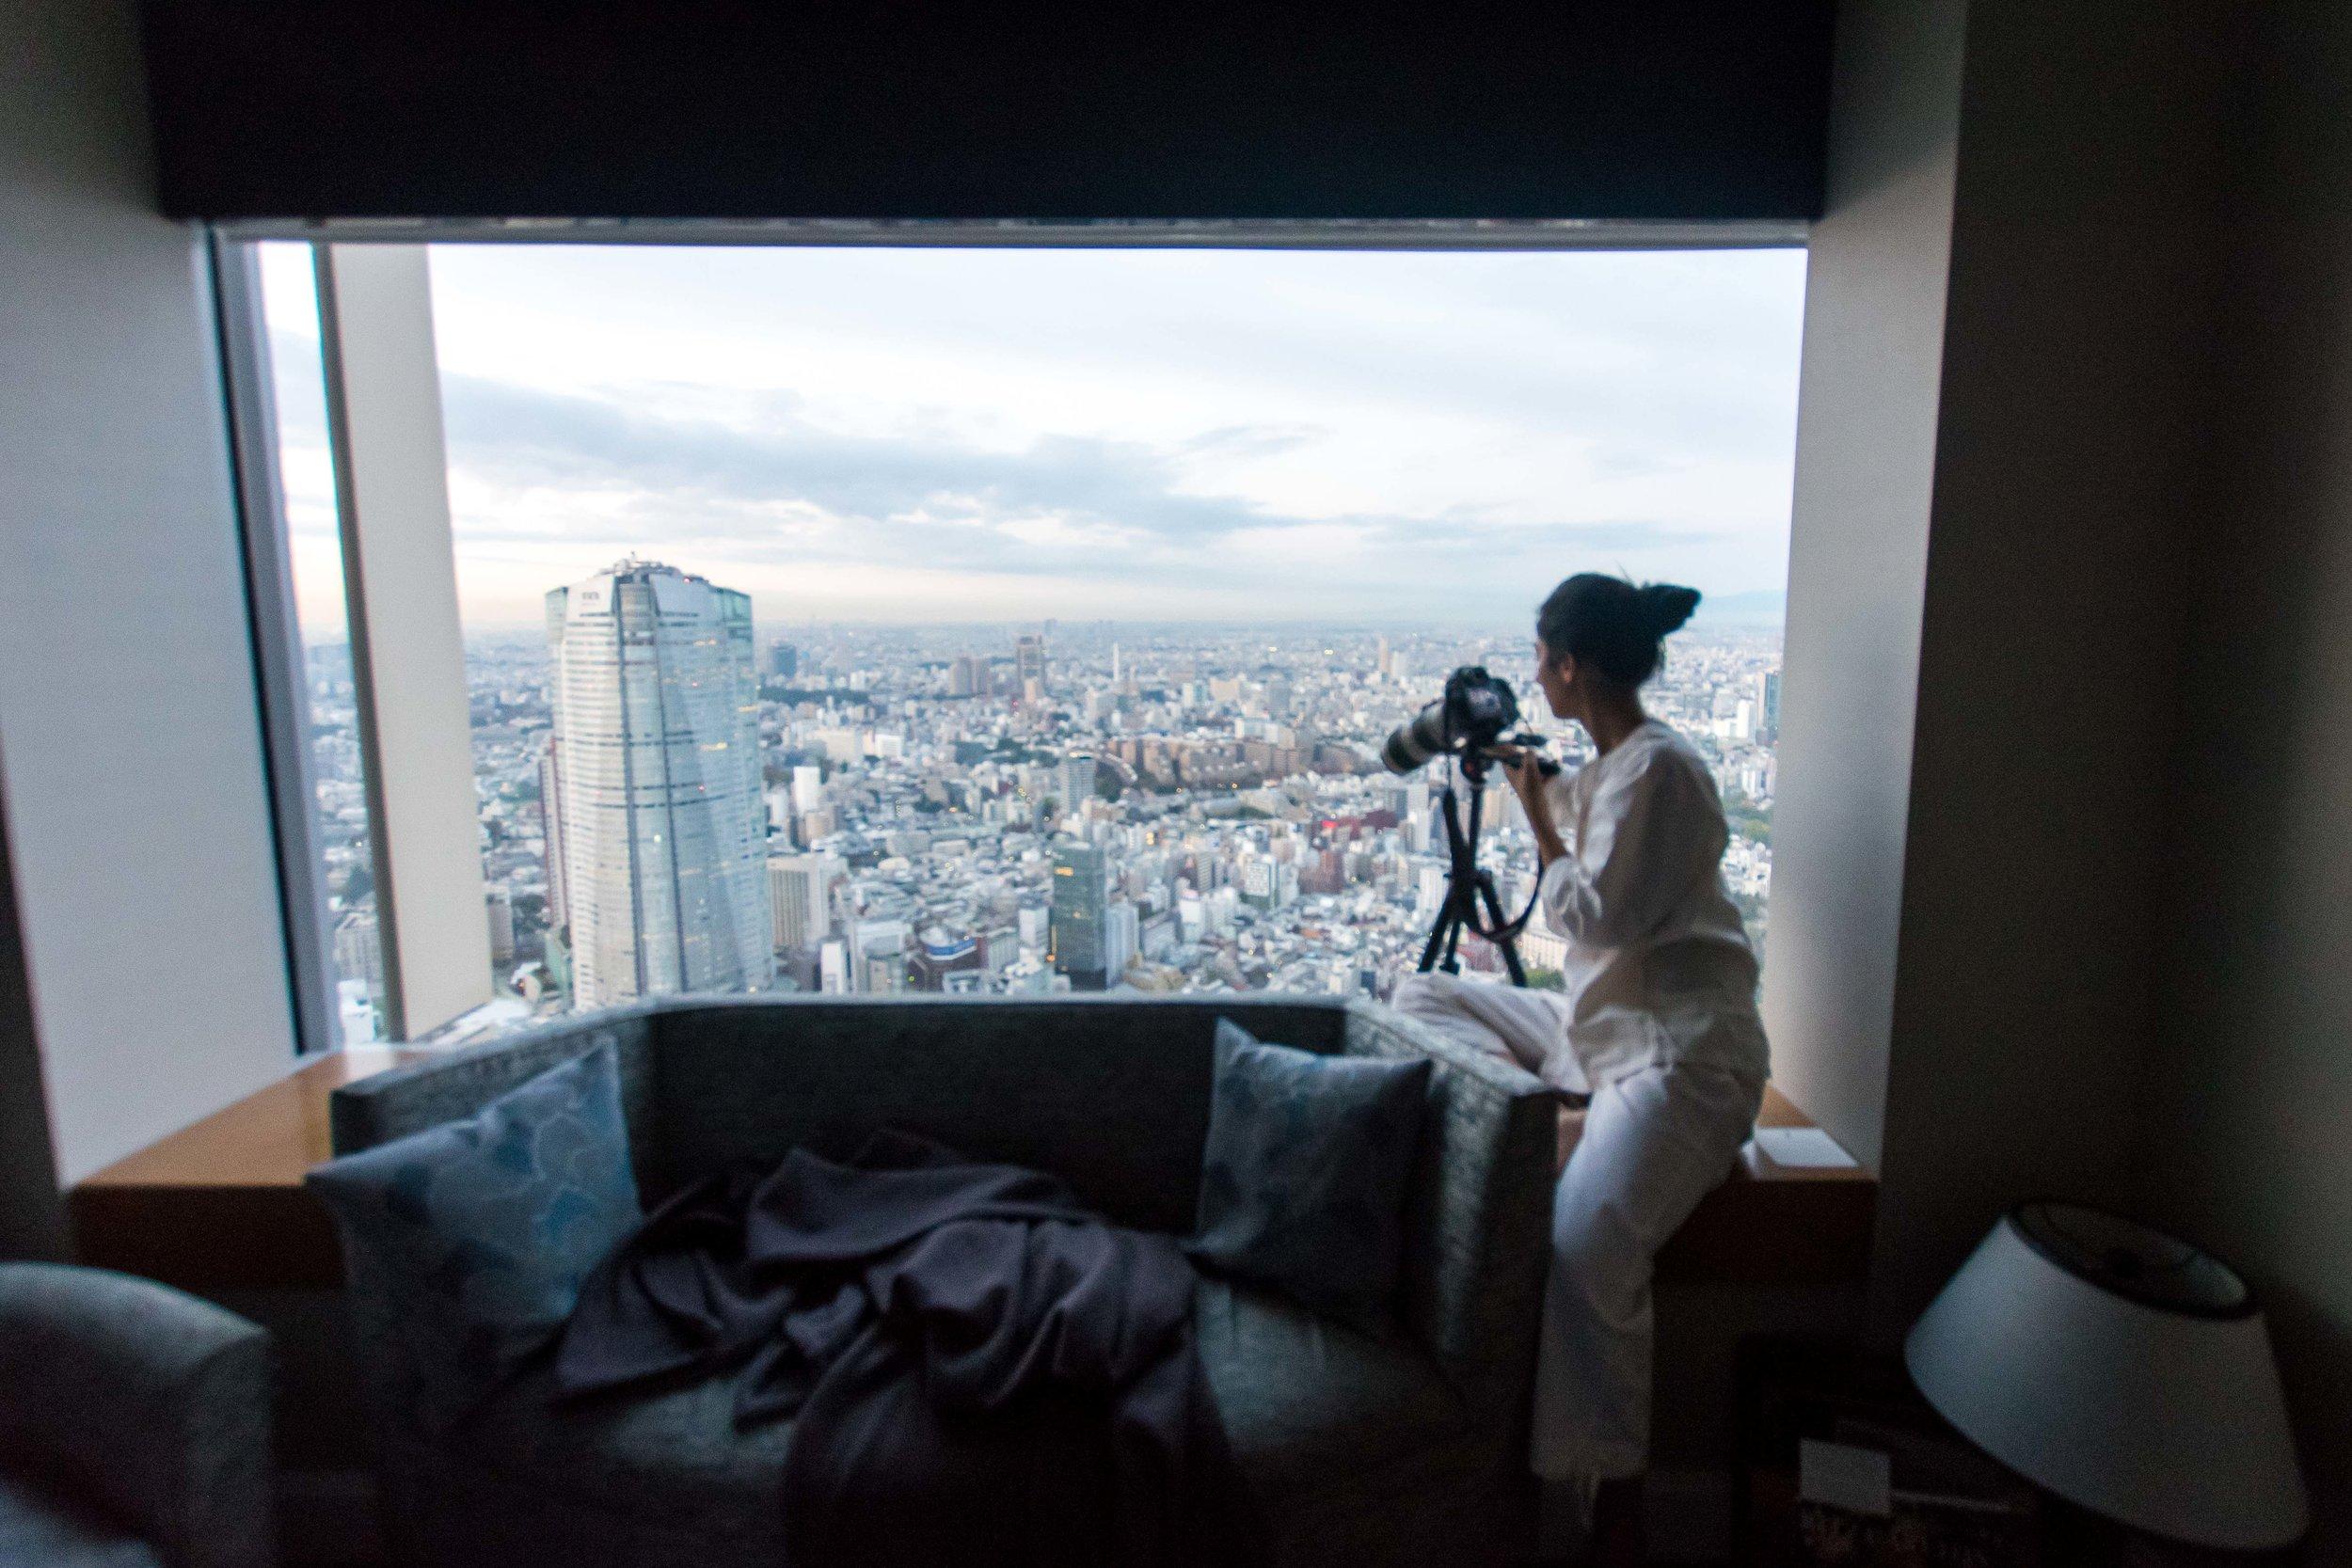 Can't get enough of this view at Ritz-Carlton Tokyo!